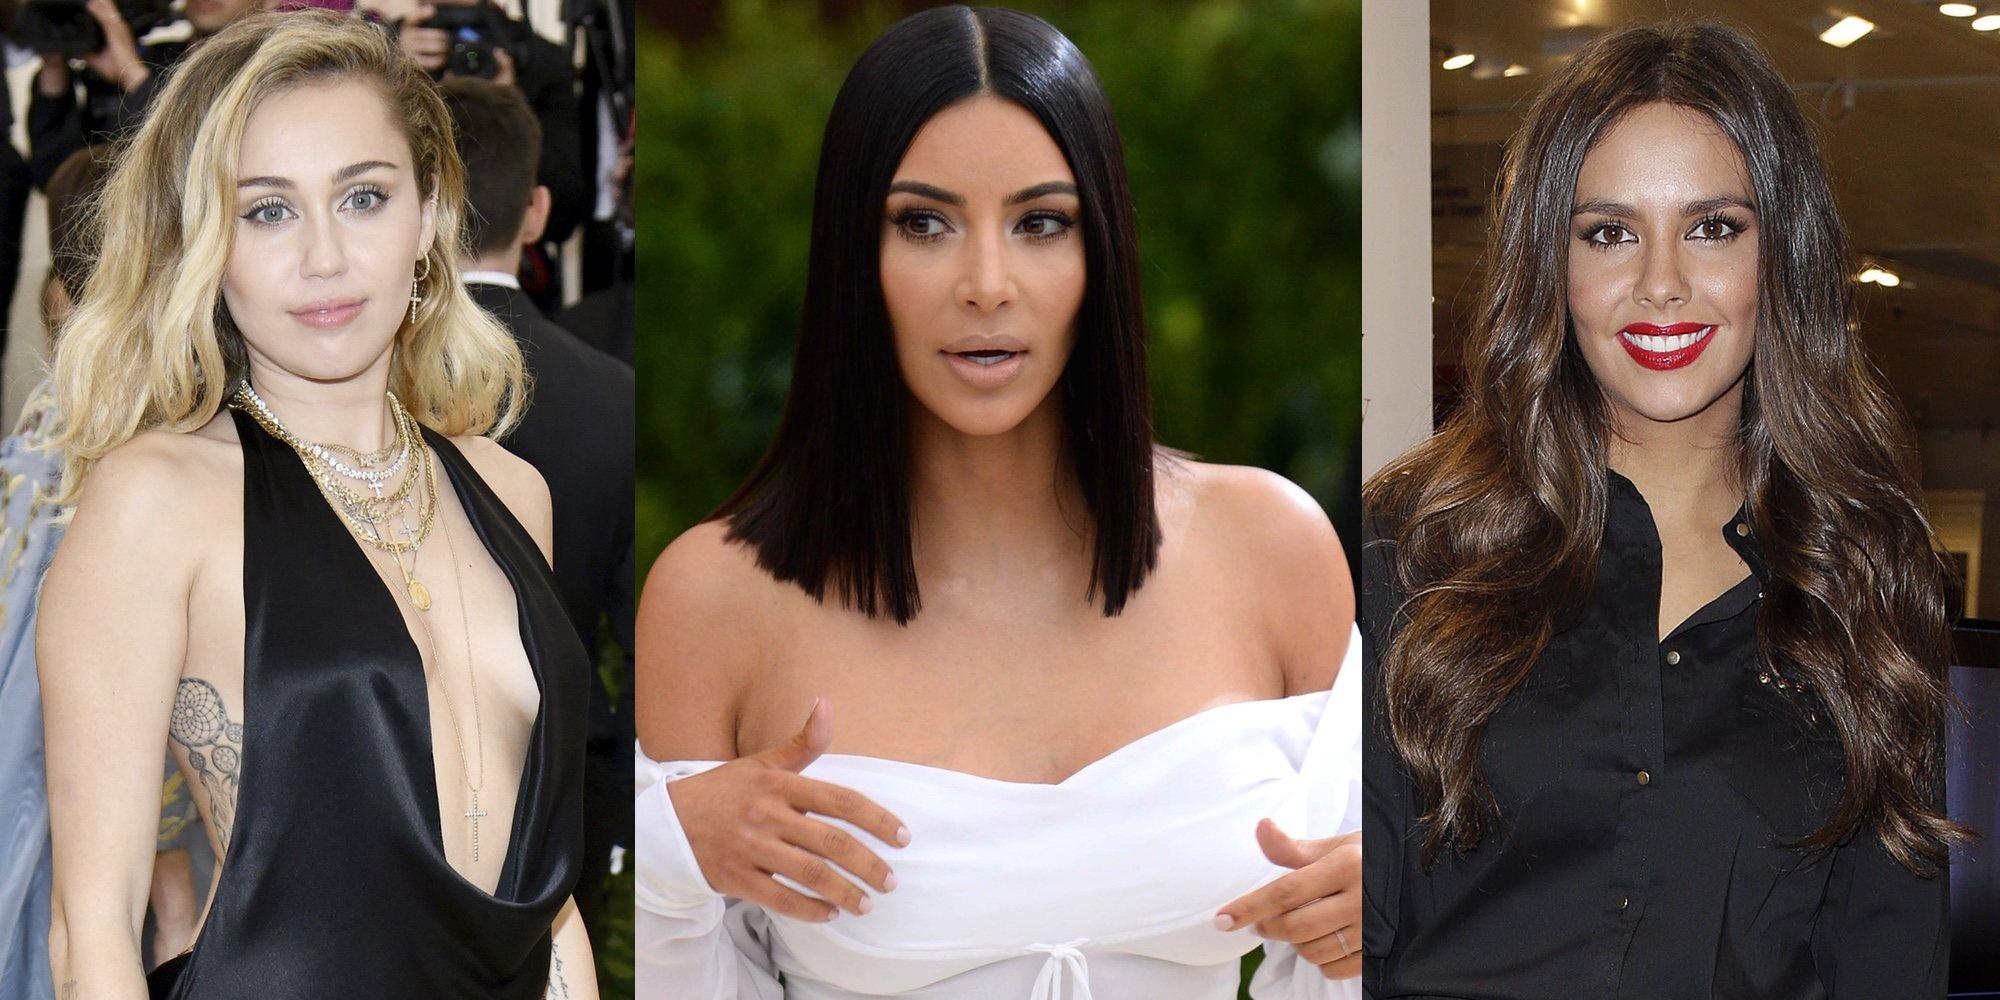 Famosas desnudas: Kim Kardashian, Miley Cyrus, Cristina Pedroche y otras celebrities que se han desnudado voluntariamente